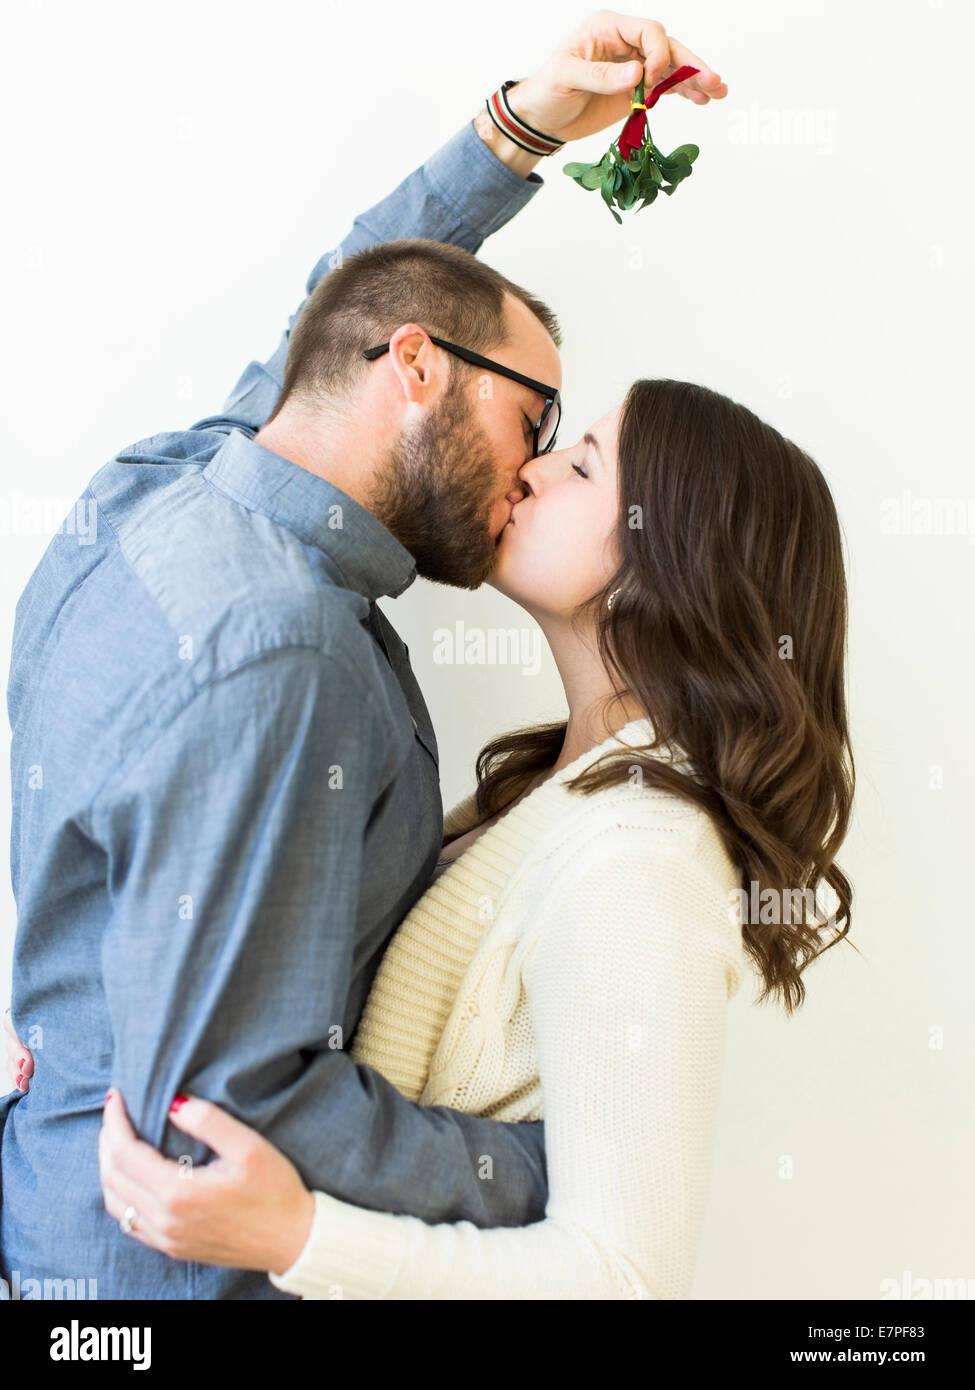 Under the mistletoe dating